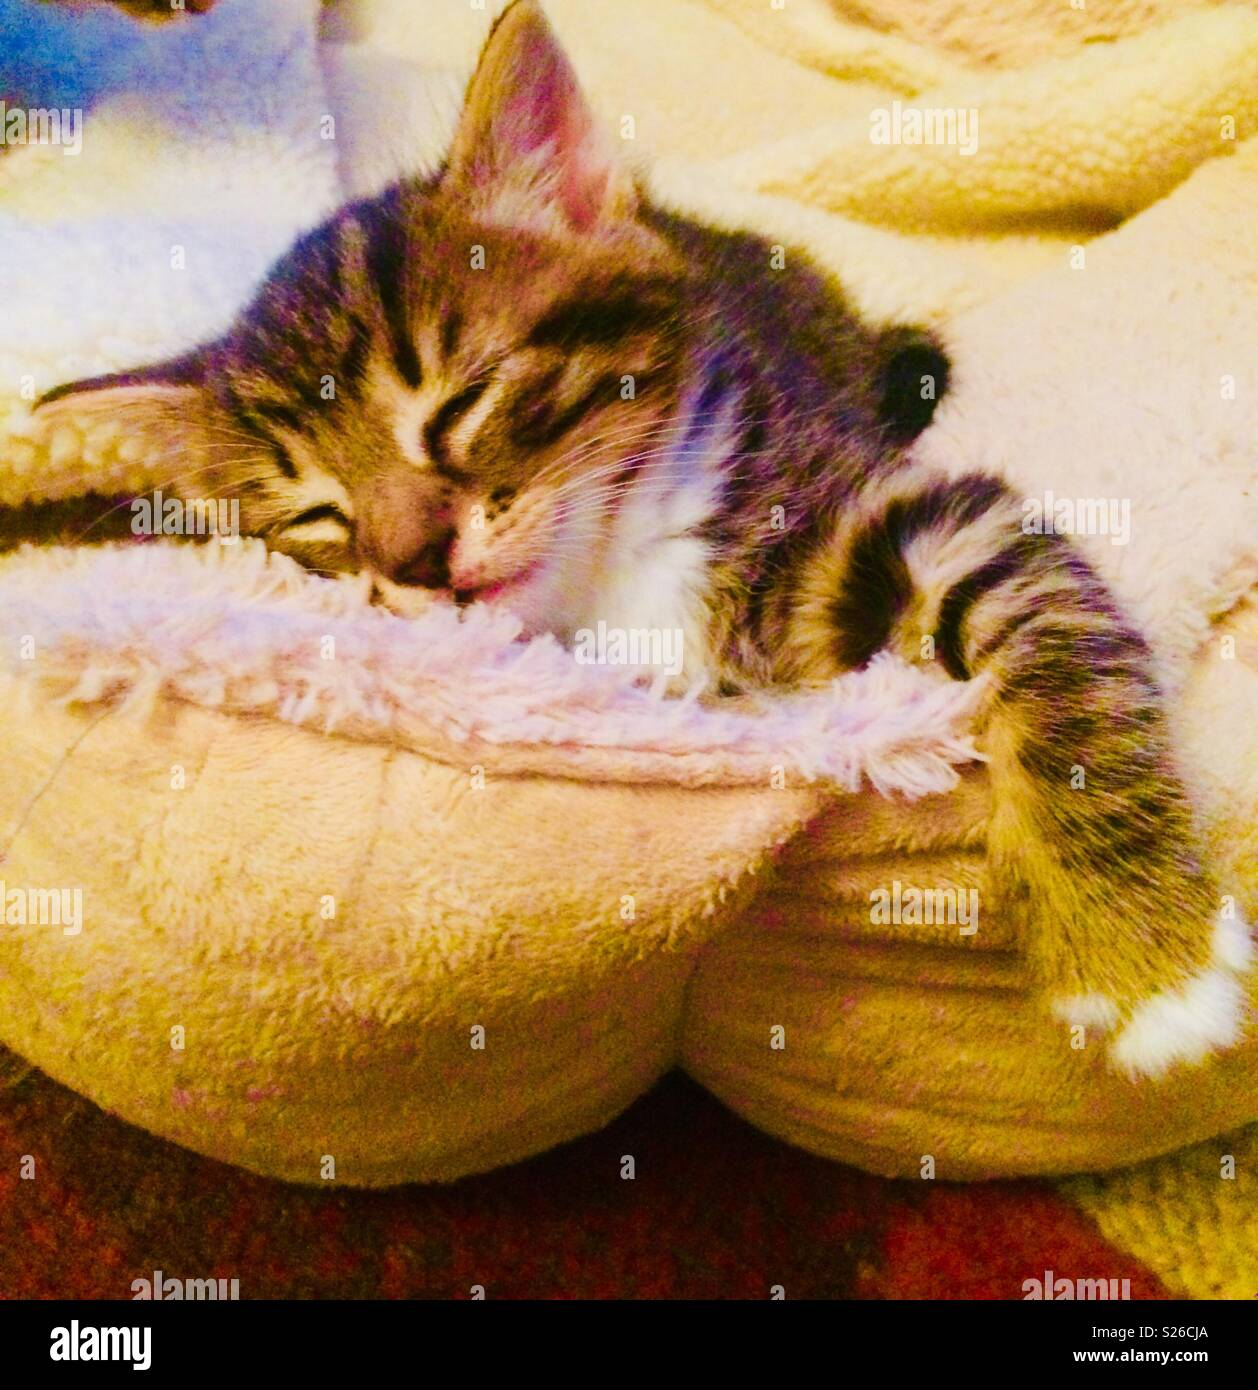 Sleeping cute Tabbie Kitten in dogs comfy bed Stock Photo